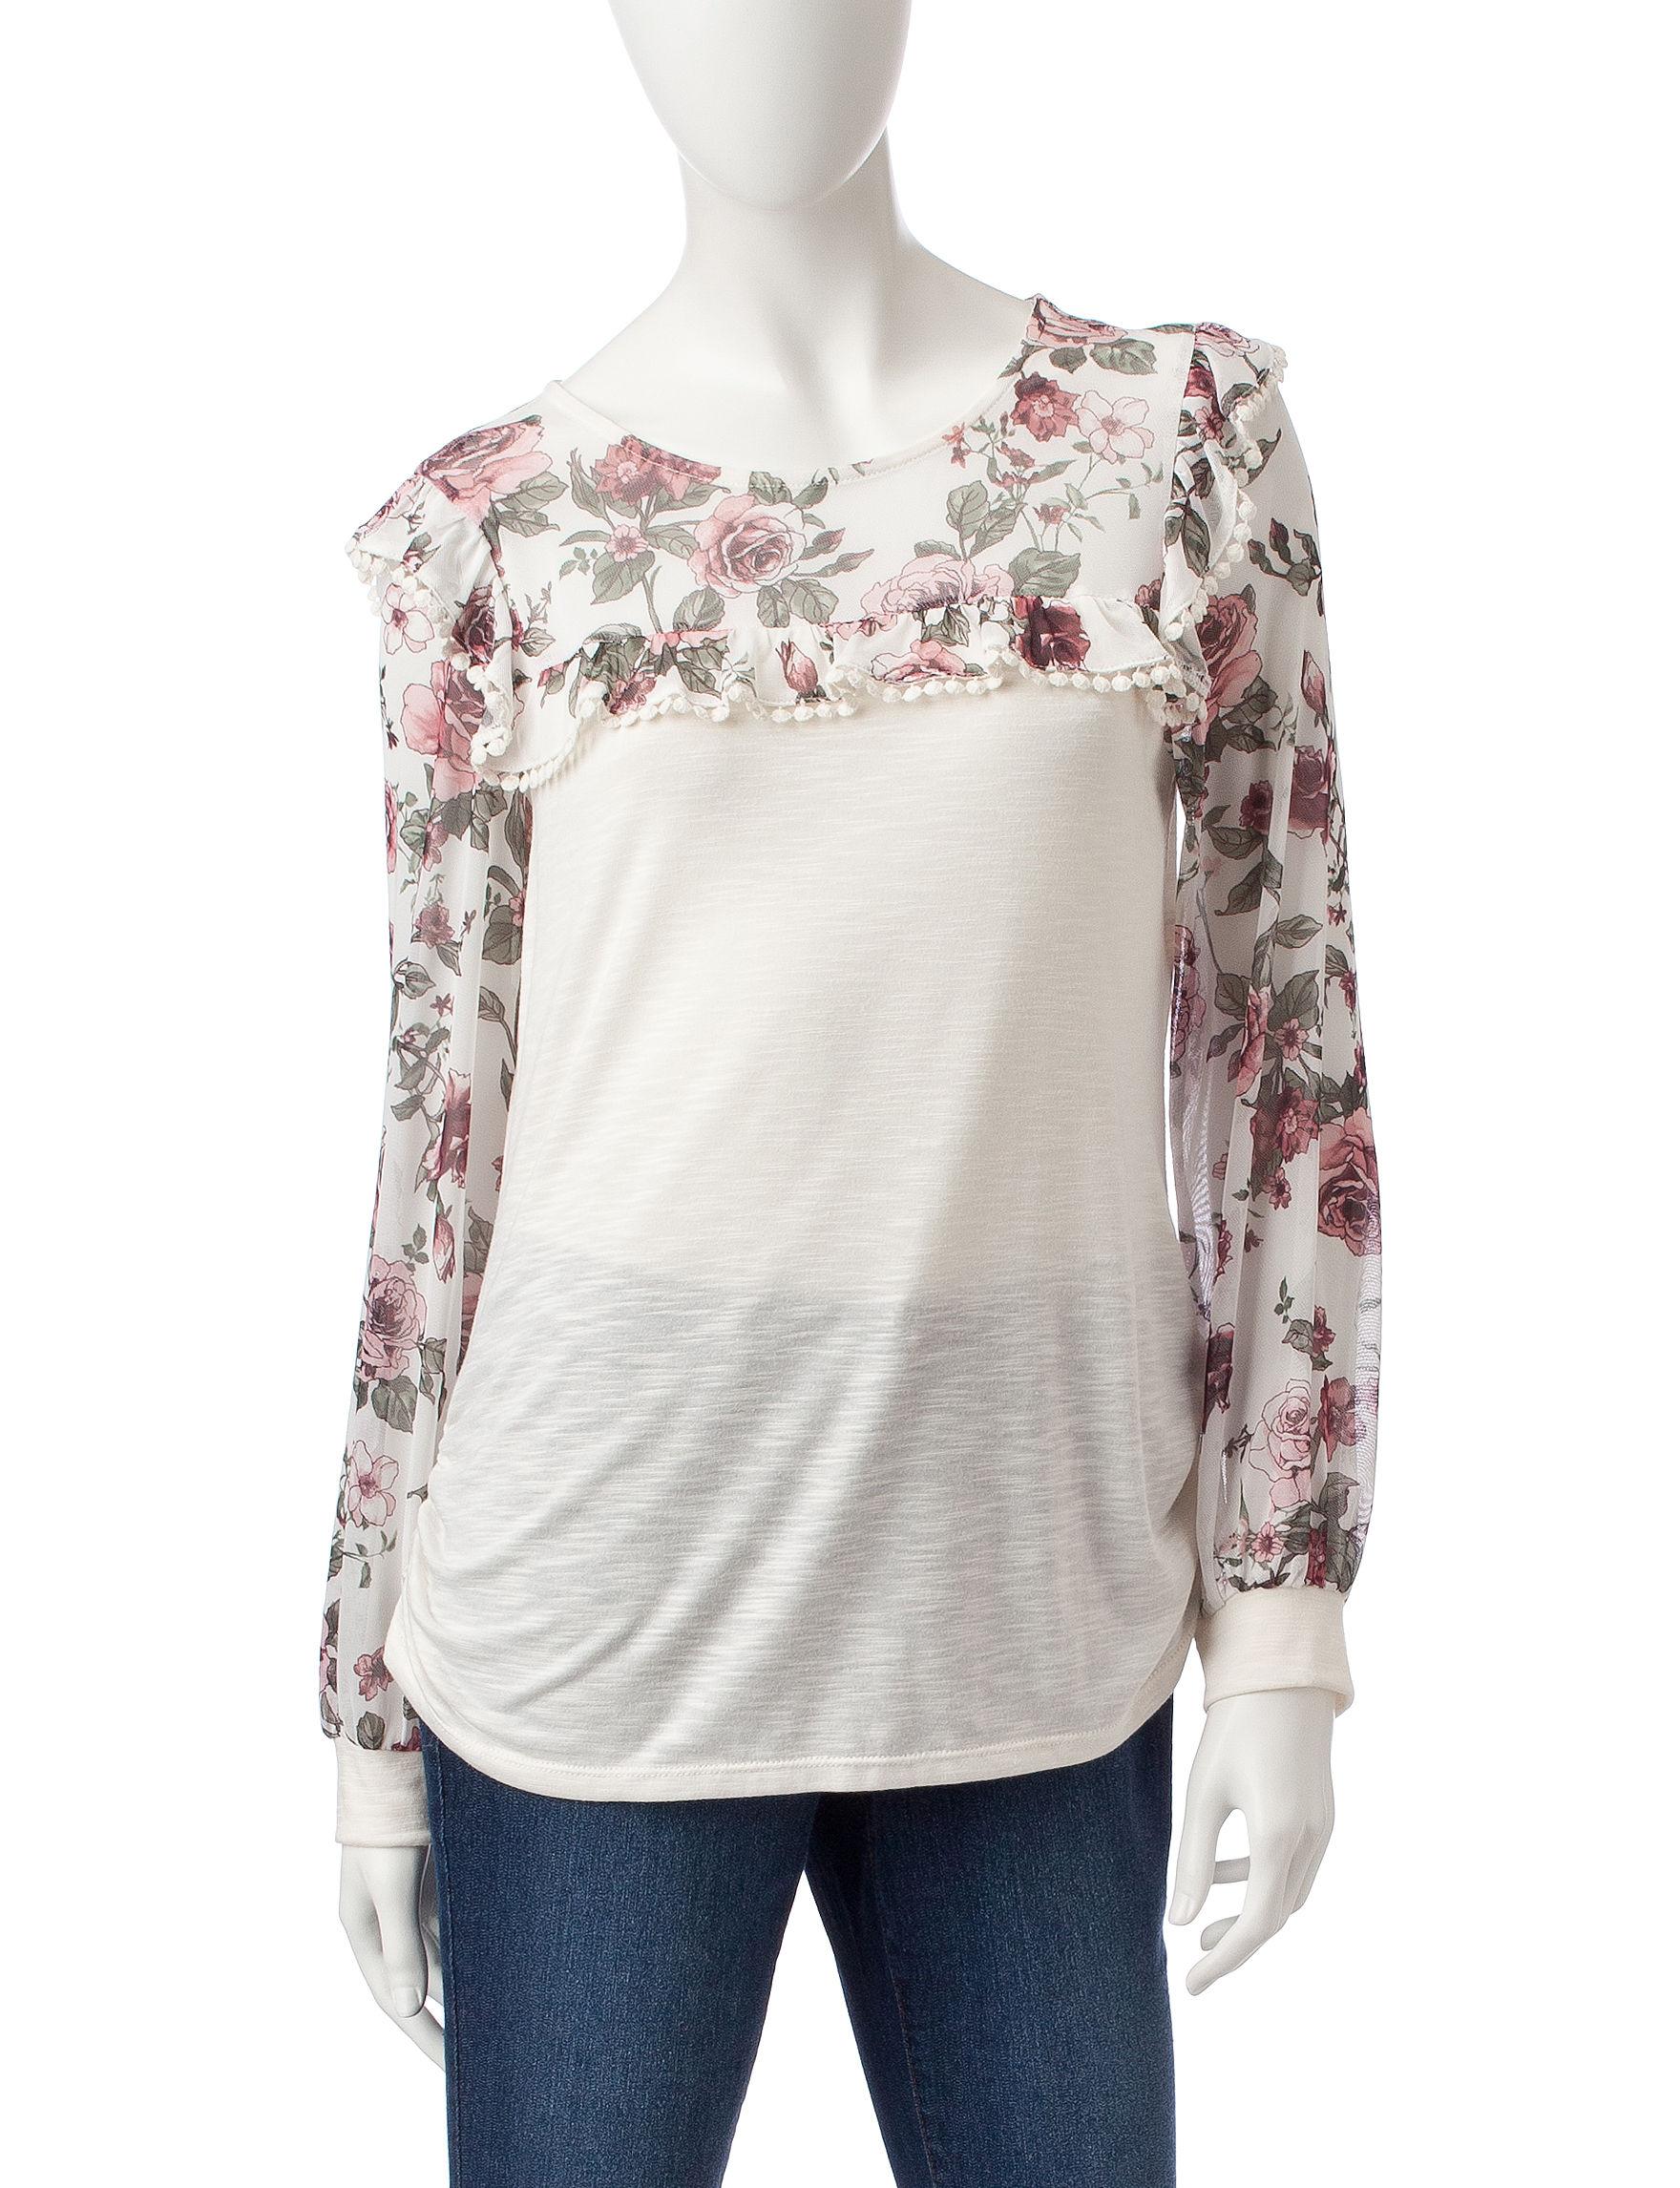 Signature Studio Ivory Floral Shirts & Blouses